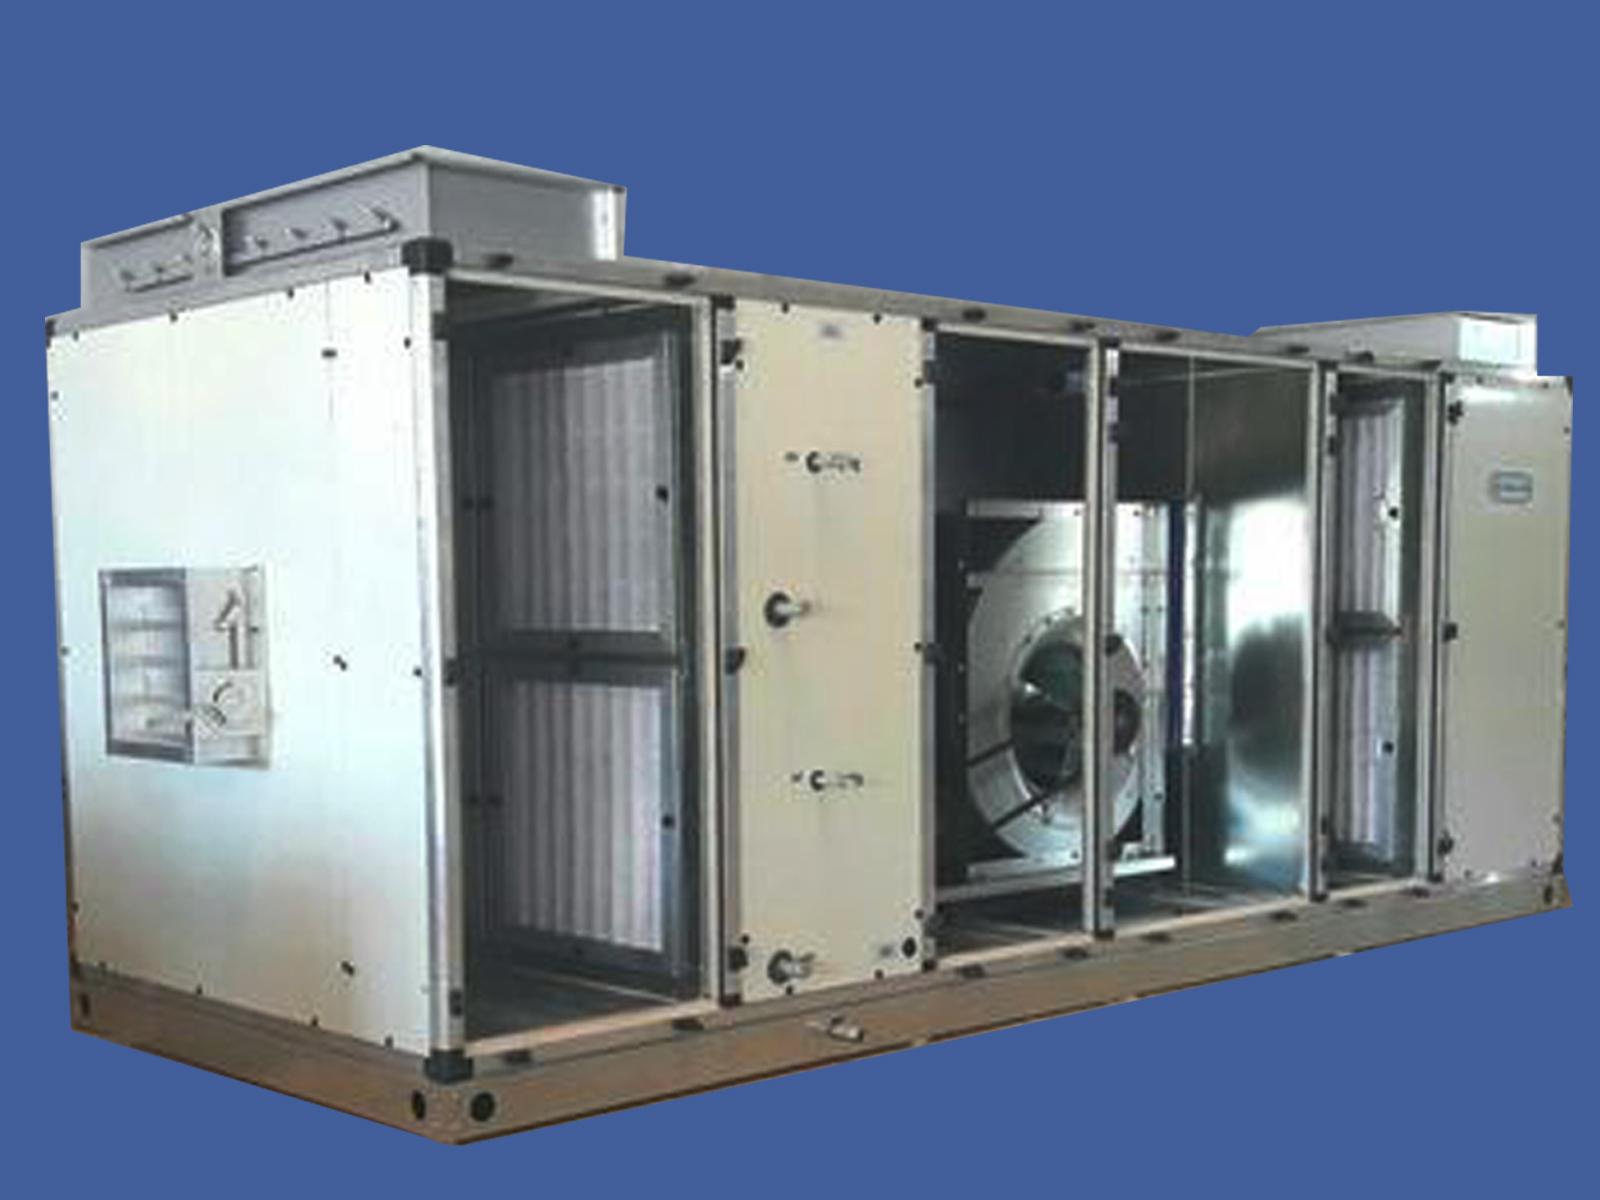 Air Hundling Unit AHU